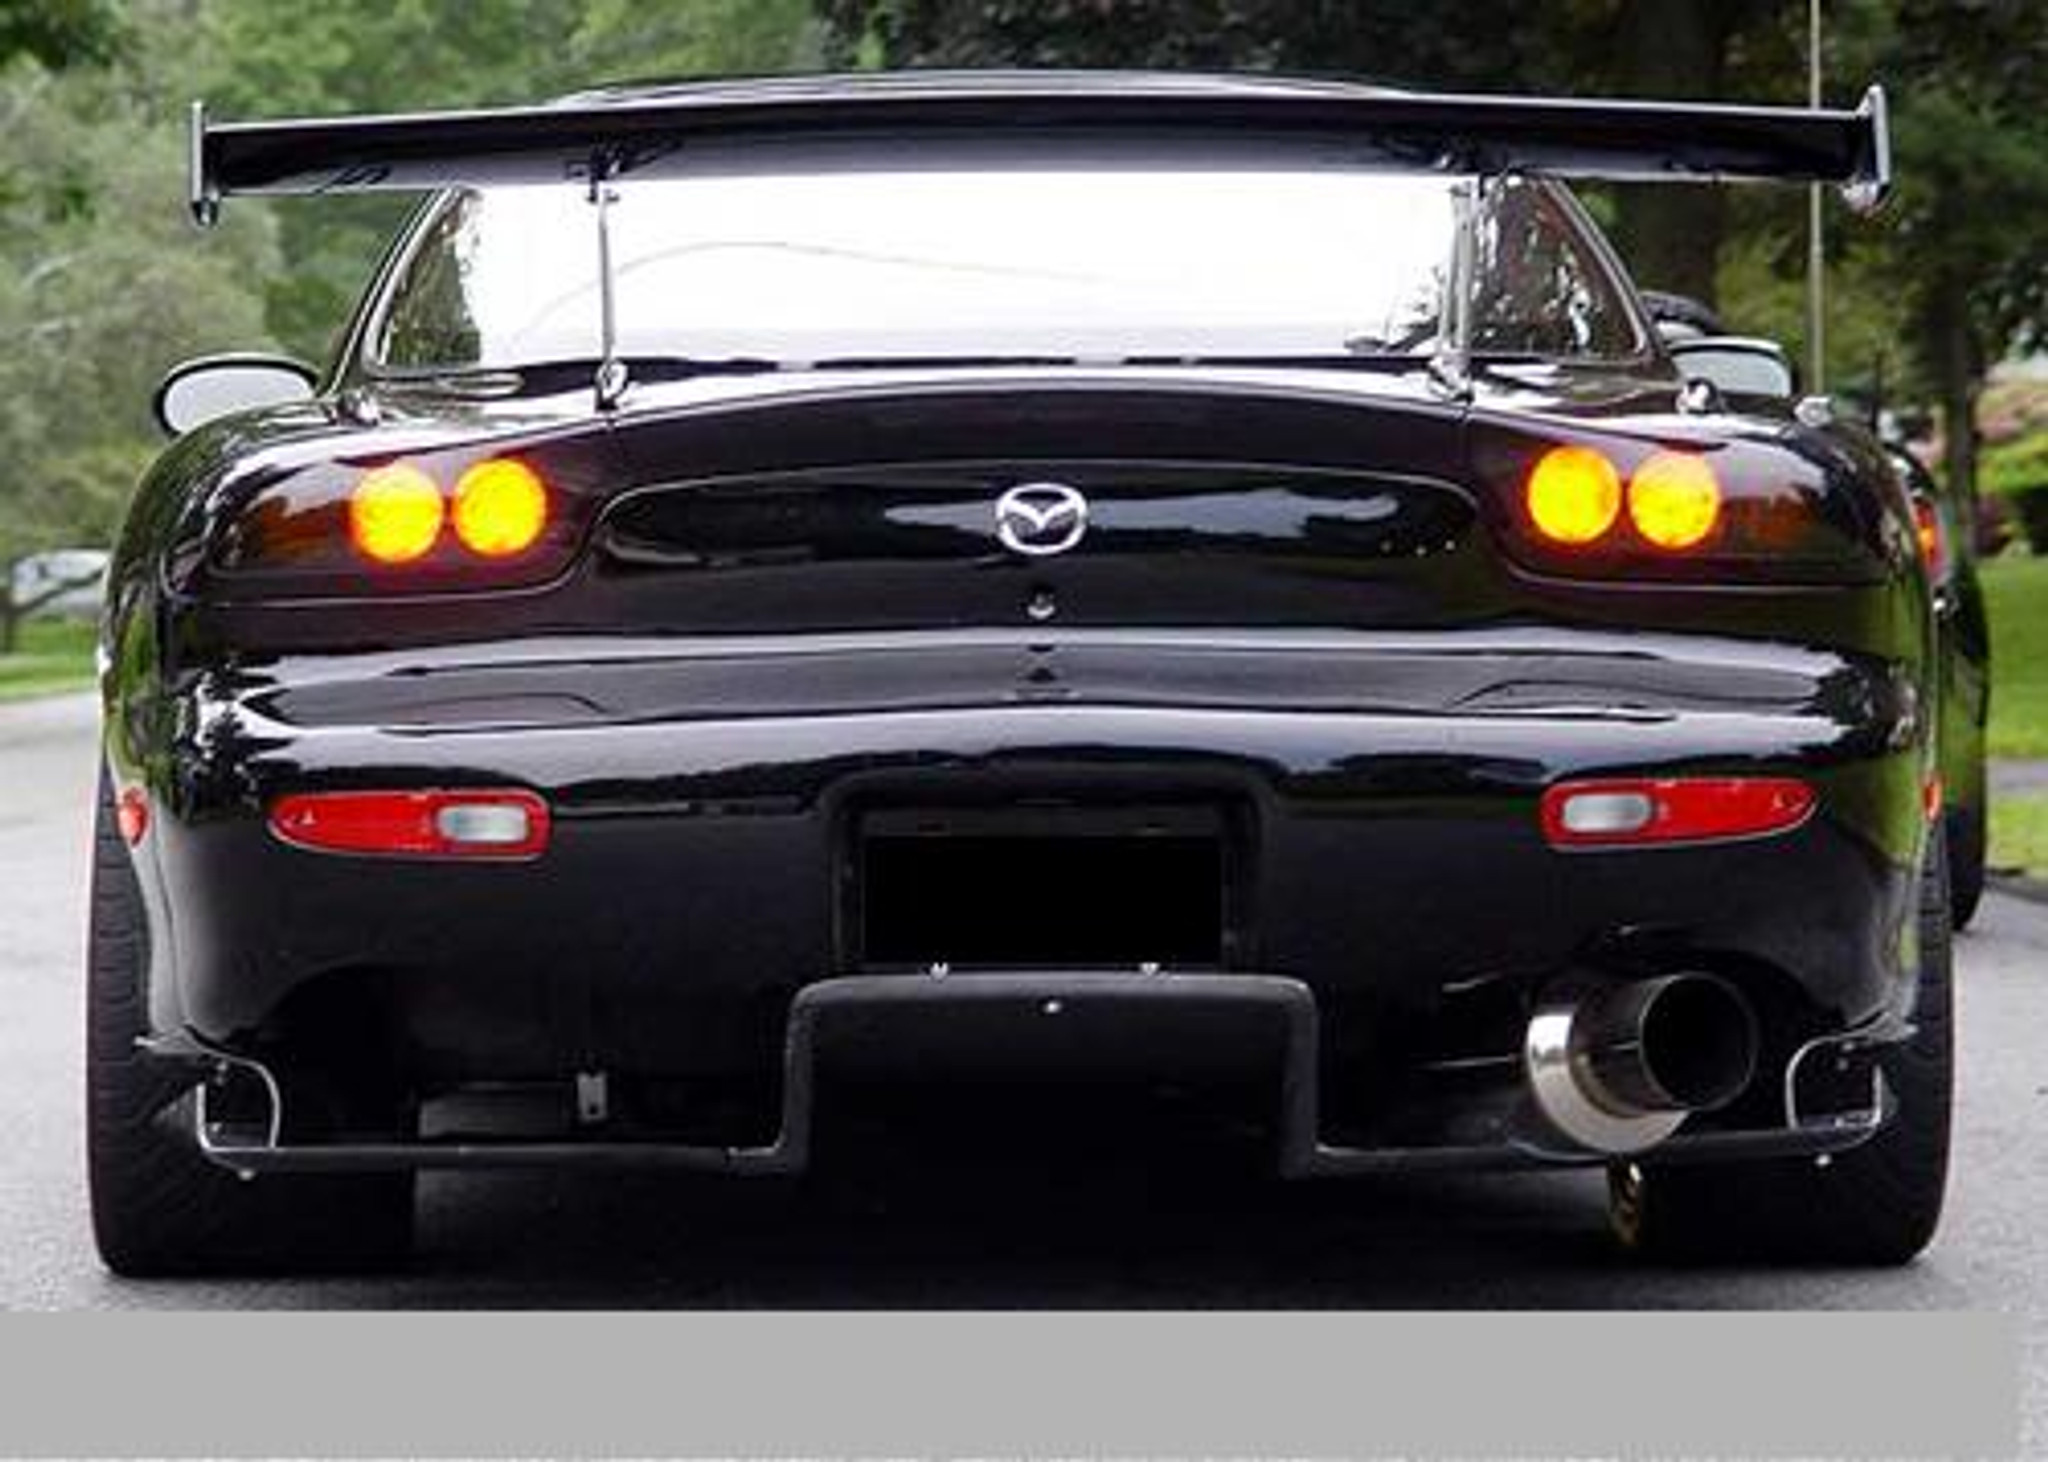 Mazda Rx7 Fd >> Mazda Rx7 Fd3s Black Grp Rear Diffuser Body Kit